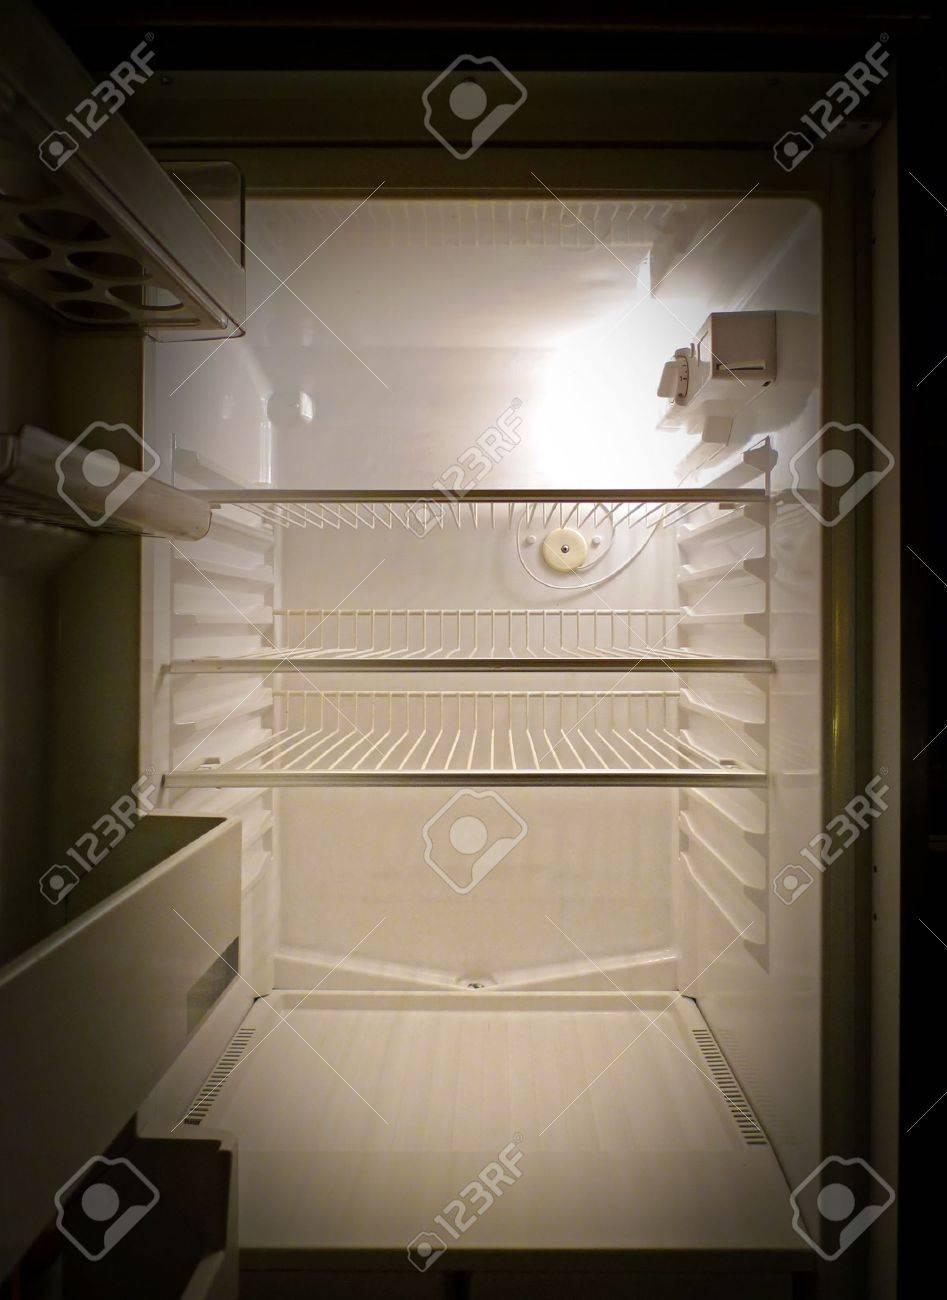 Interior of an empty fridge lit by the internal lamp Standard-Bild - 5077748